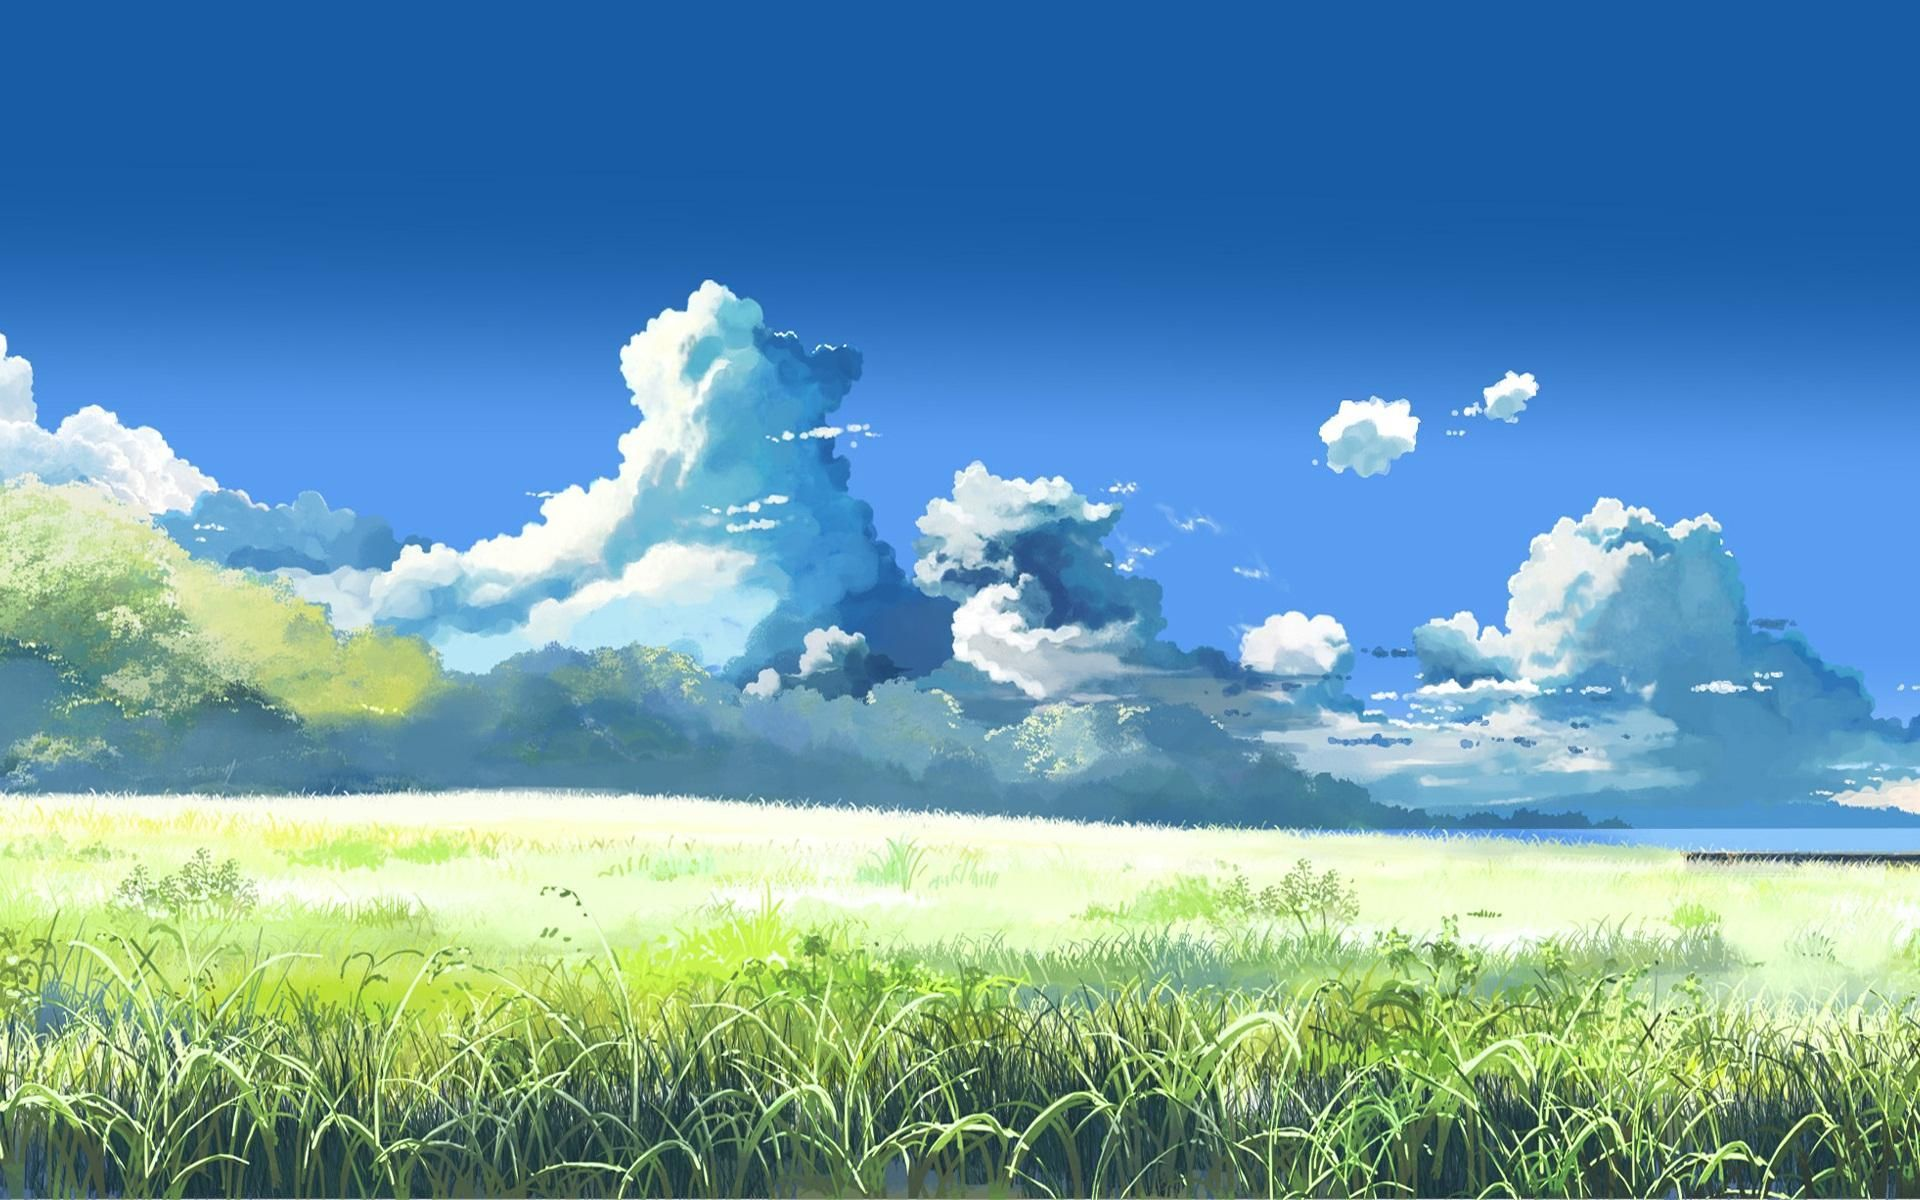 scenic anime wallpaper